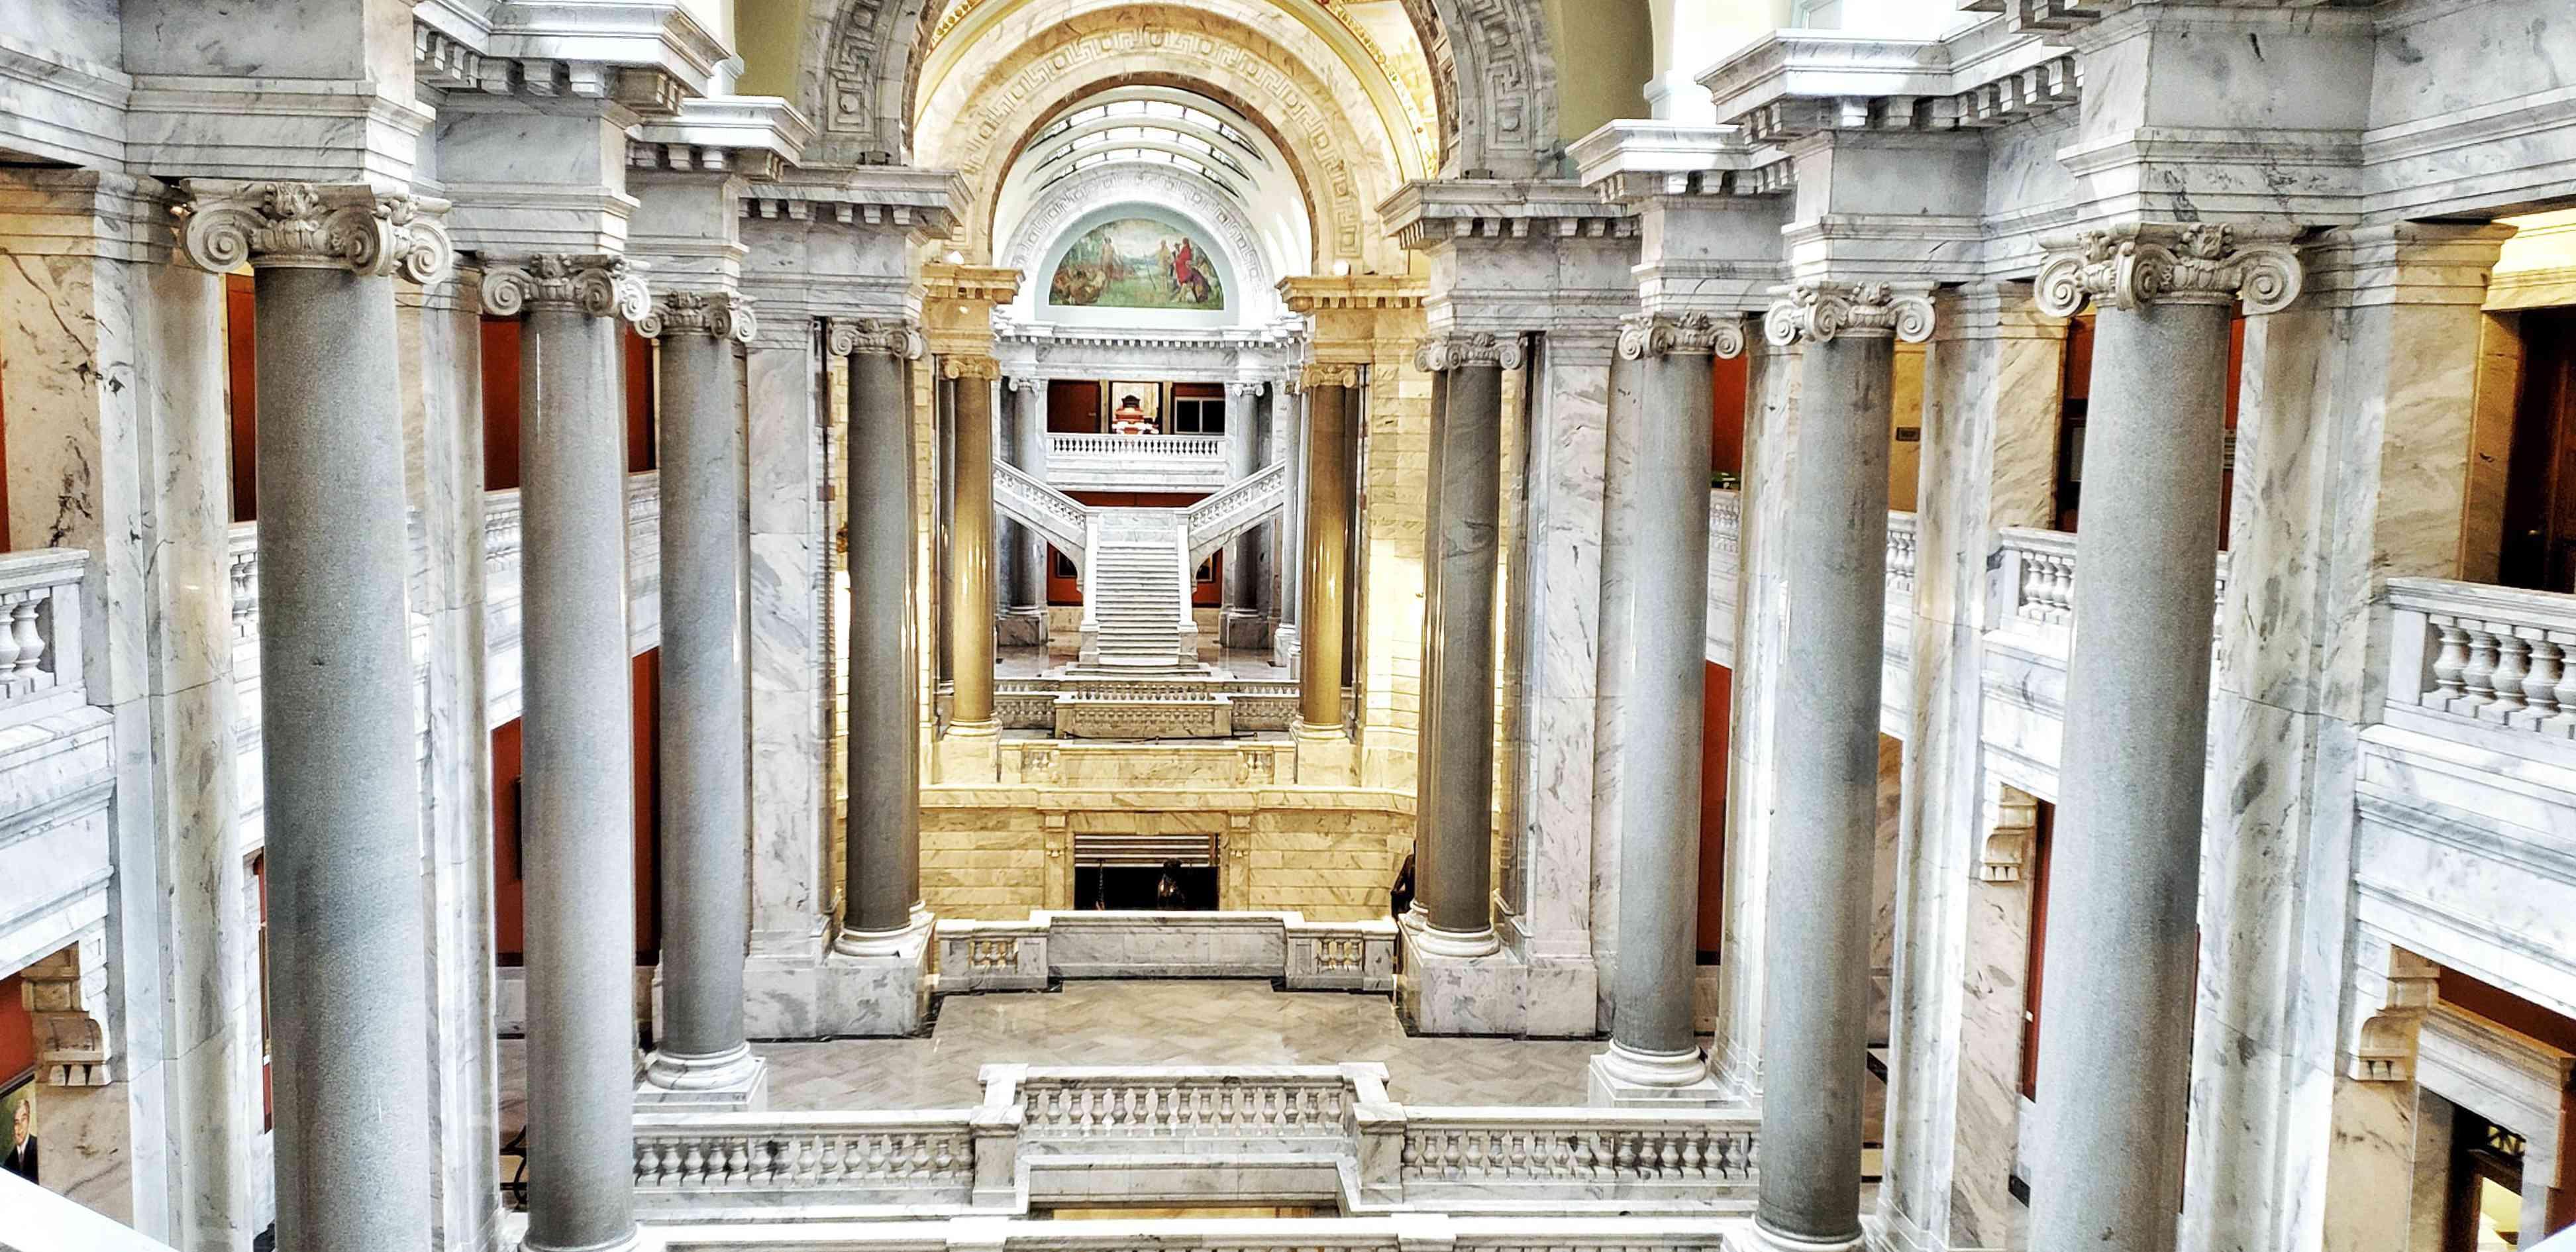 Kentucky State Capitol Columns